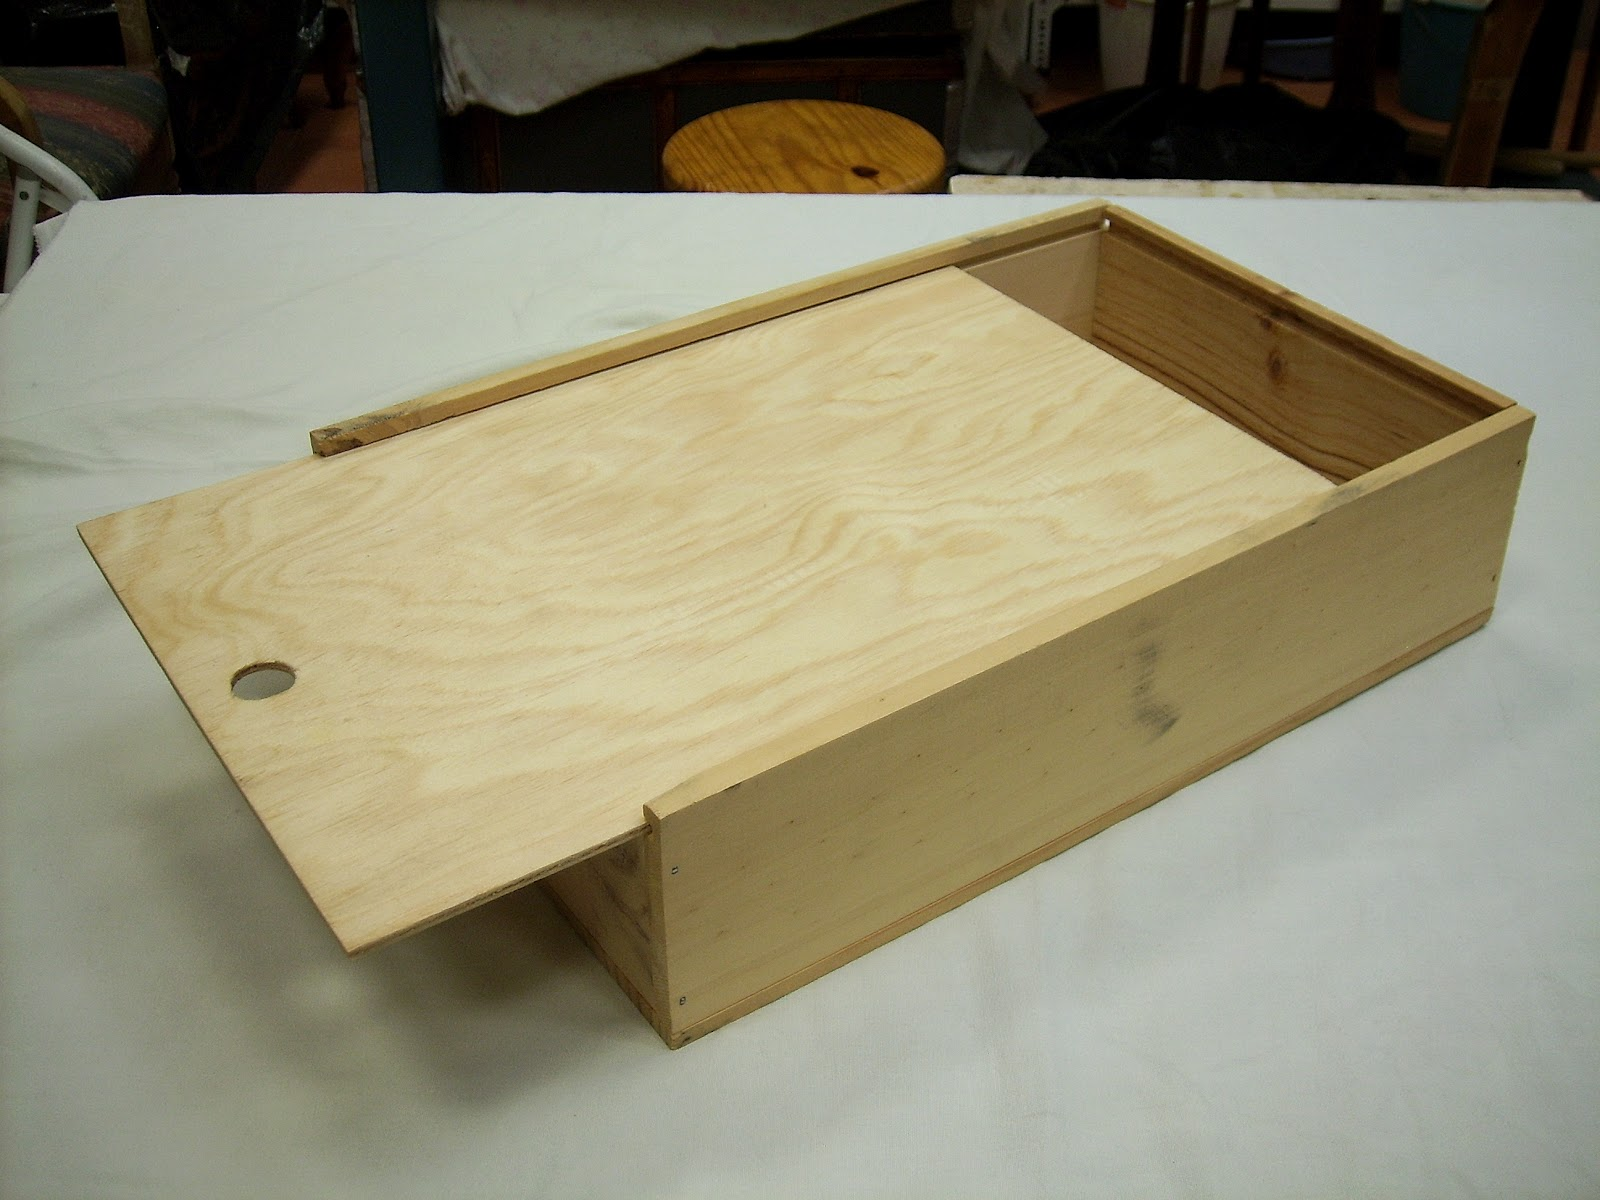 Como hacer una caja de madera facilisimocom como hacer - Hacer caja de madera ...